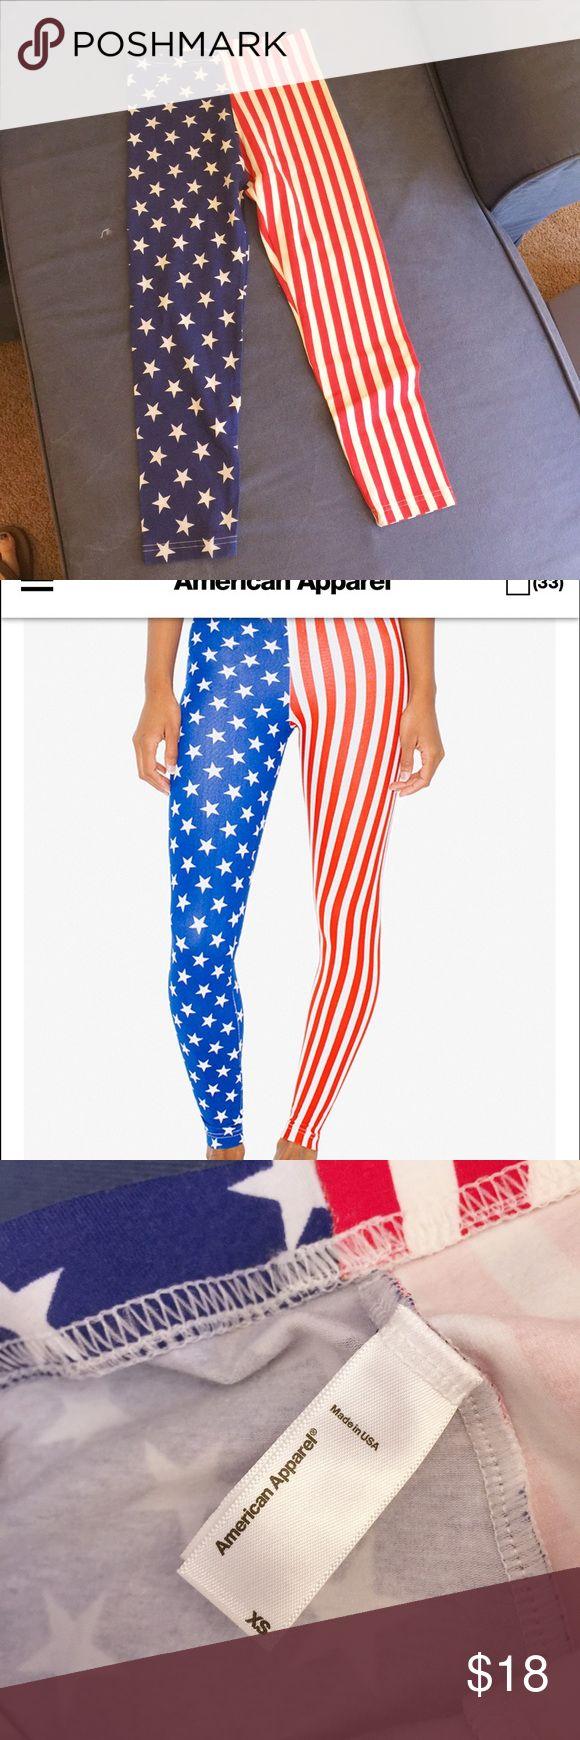 🇺🇸American Apparel US Flag cotton legging Size: XS. Brand new, never worn. American Apparel Pants Leggings